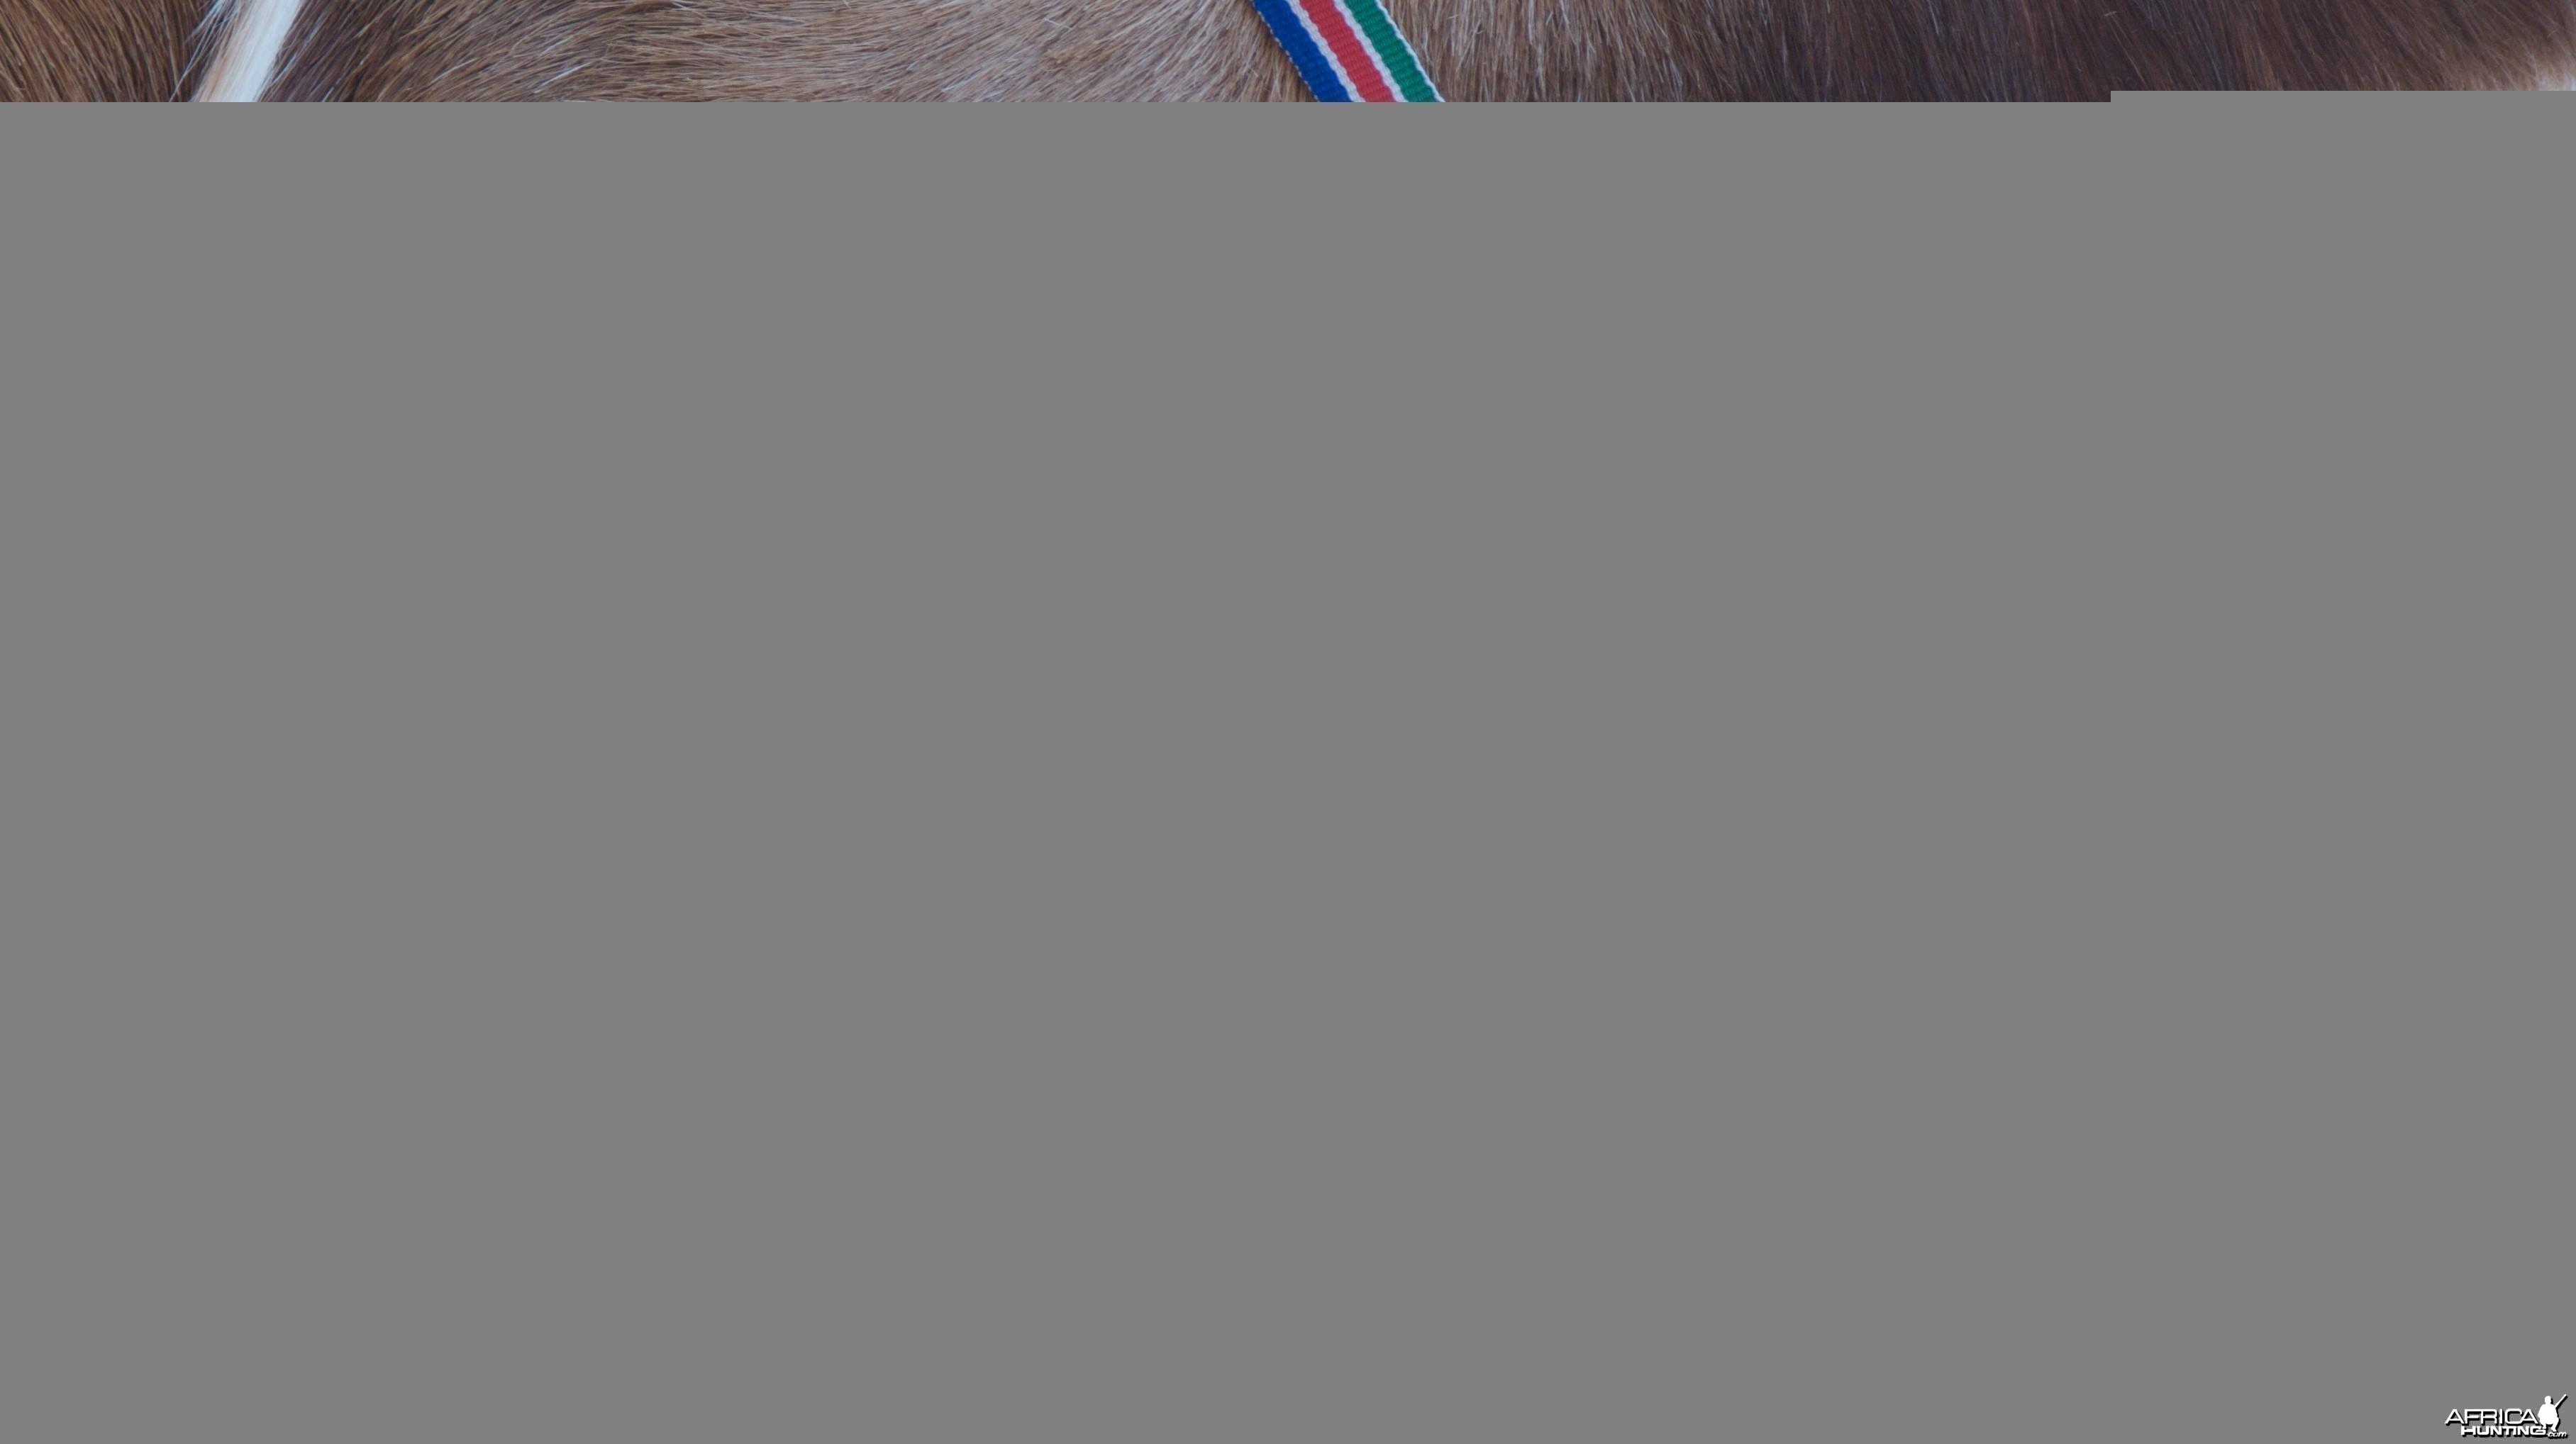 NAPHA medals